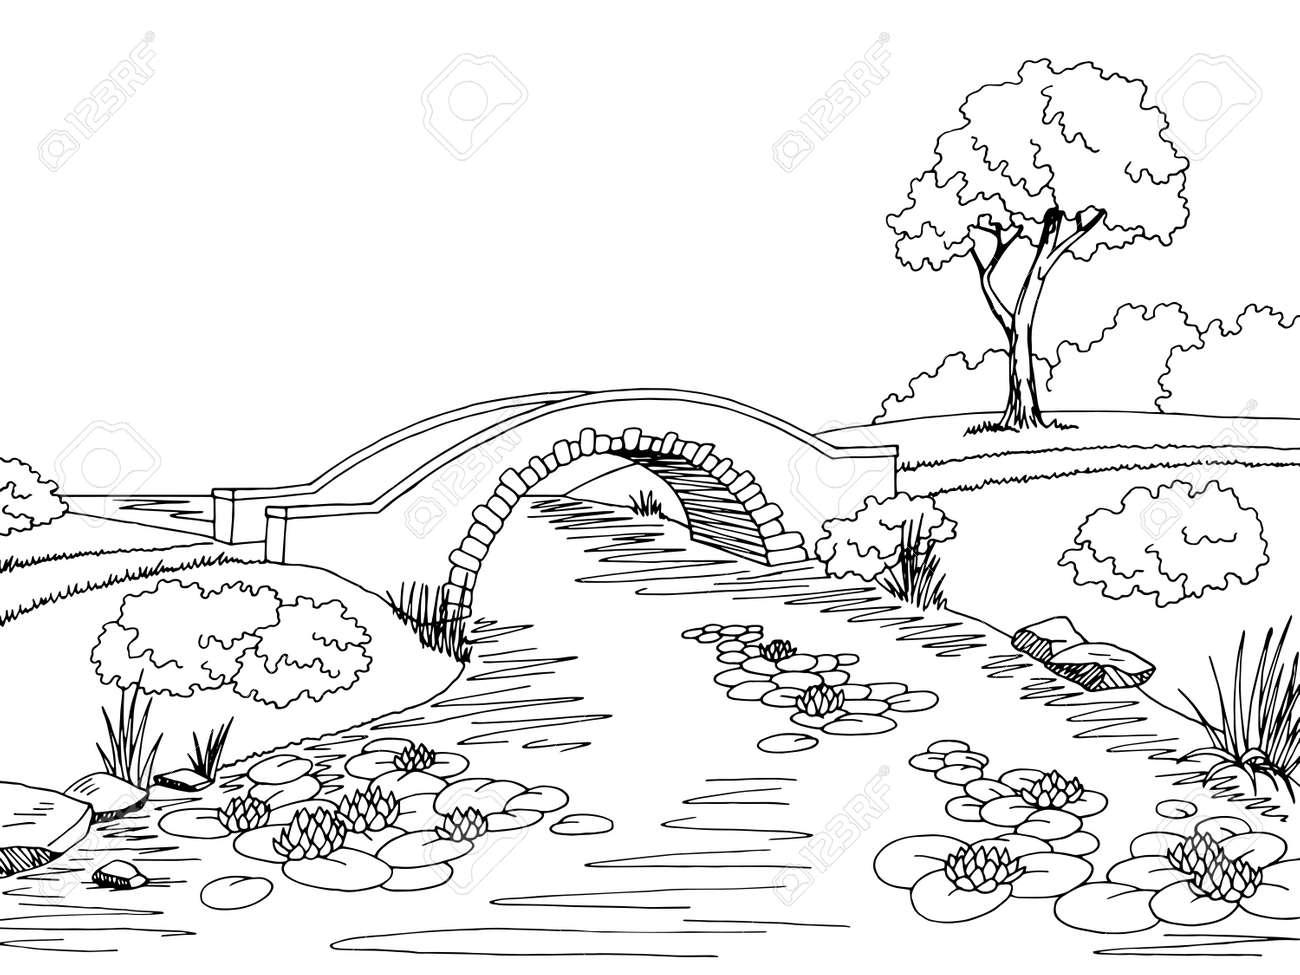 Bridge graphic black white landscape sketch illustration vector - 69259689